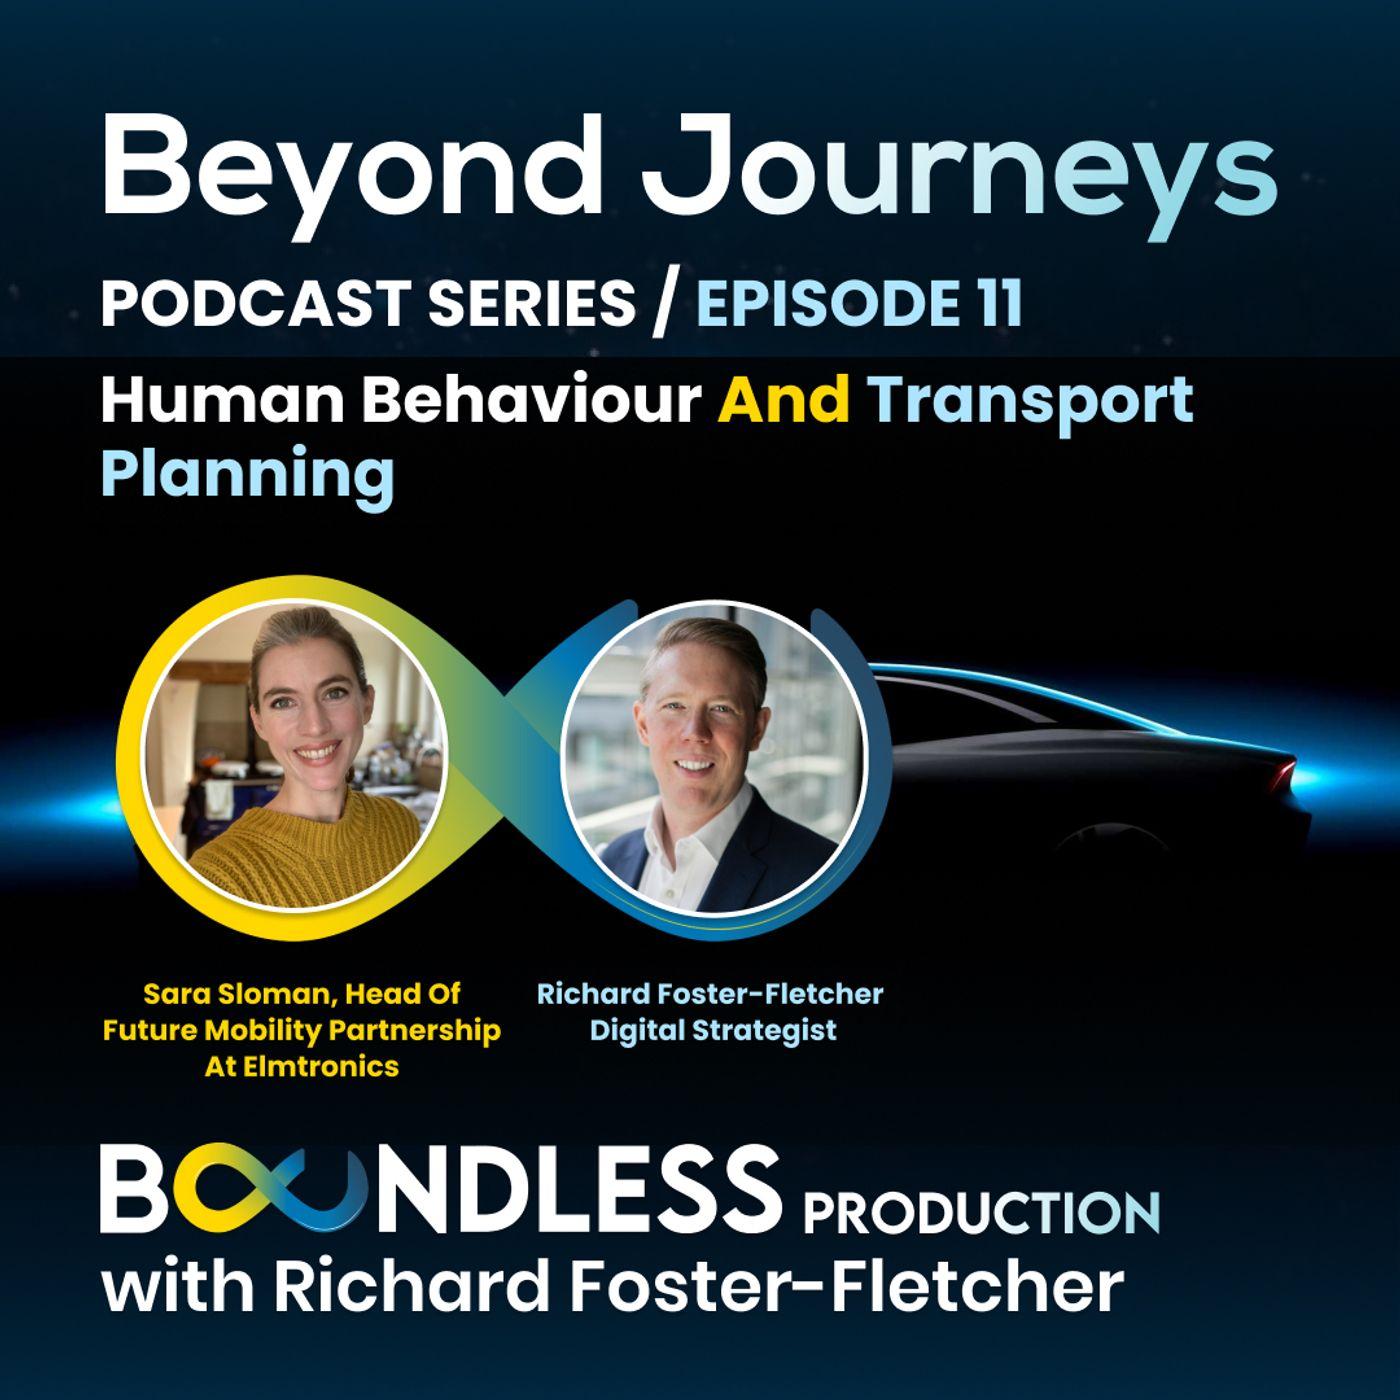 EP11 Beyond Journeys: Sara Sloman, Head of Future Mobility Partnership at Elmtronics: Human behaviour and transport planning